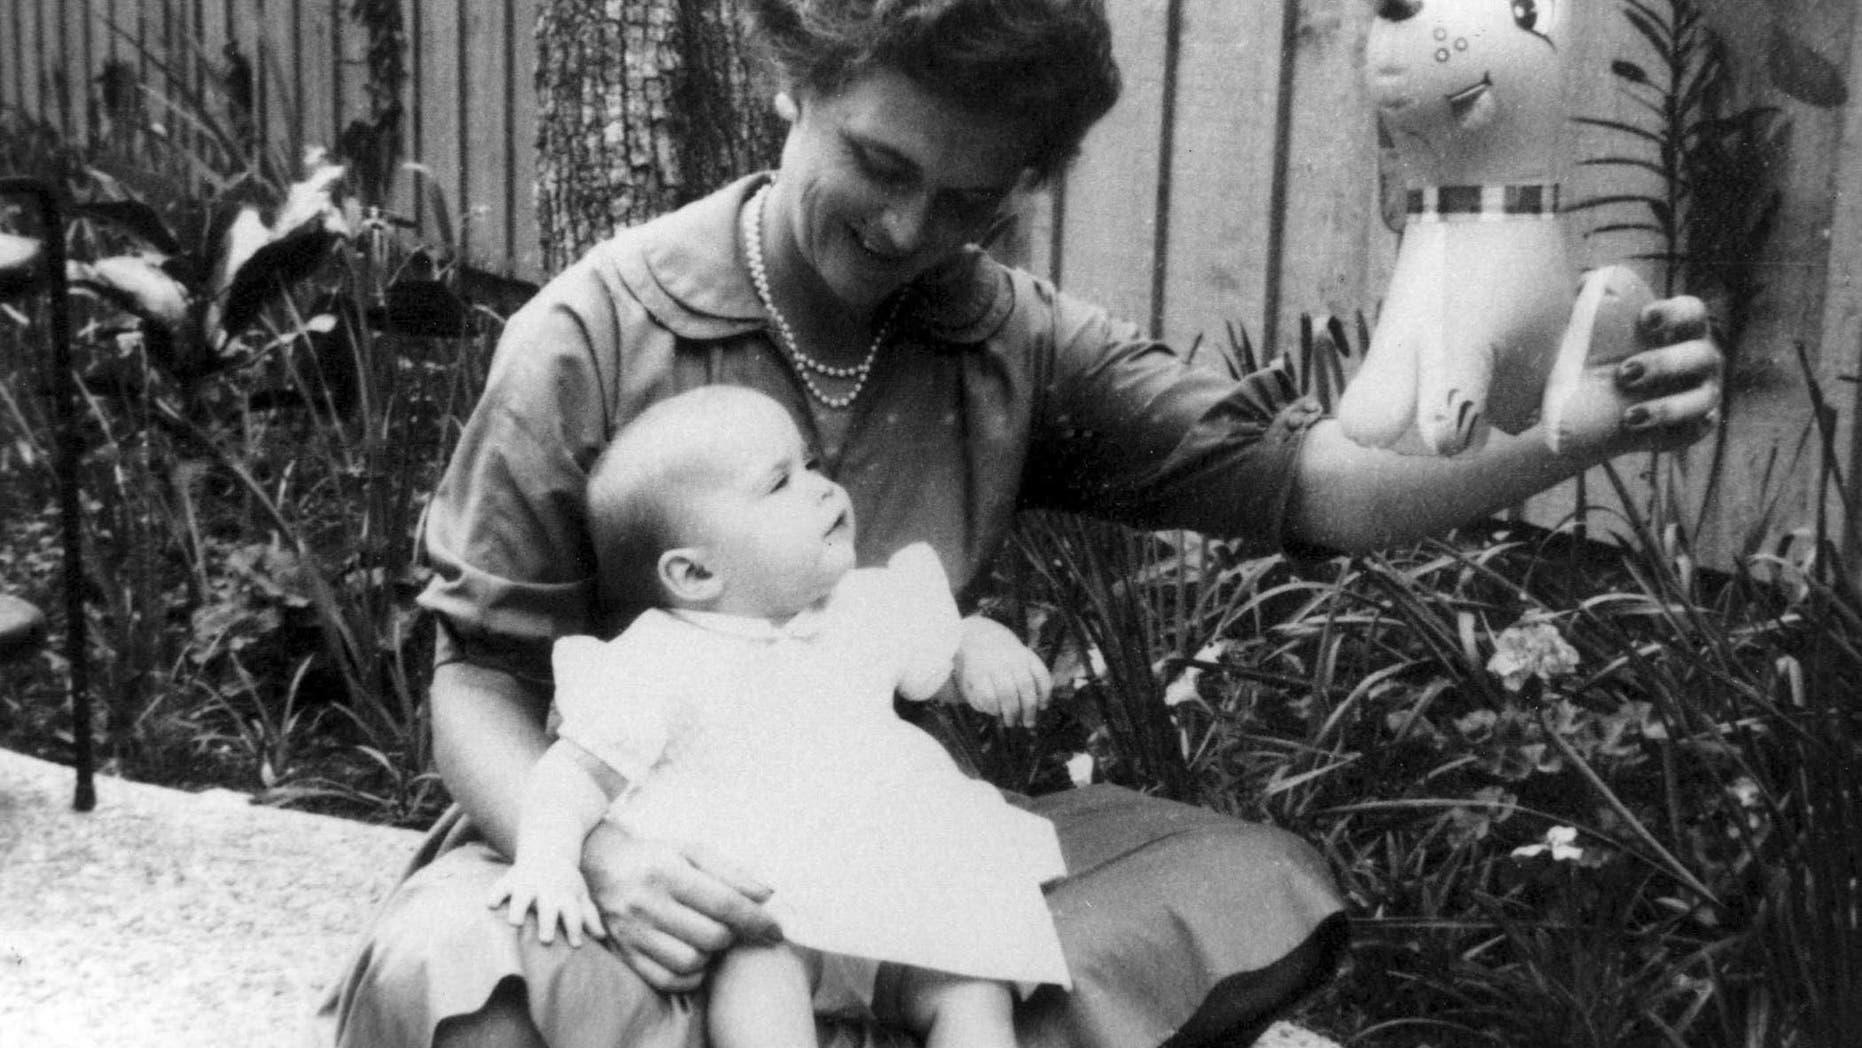 Barbara and her daughter, Doro, Easter, April 1960.